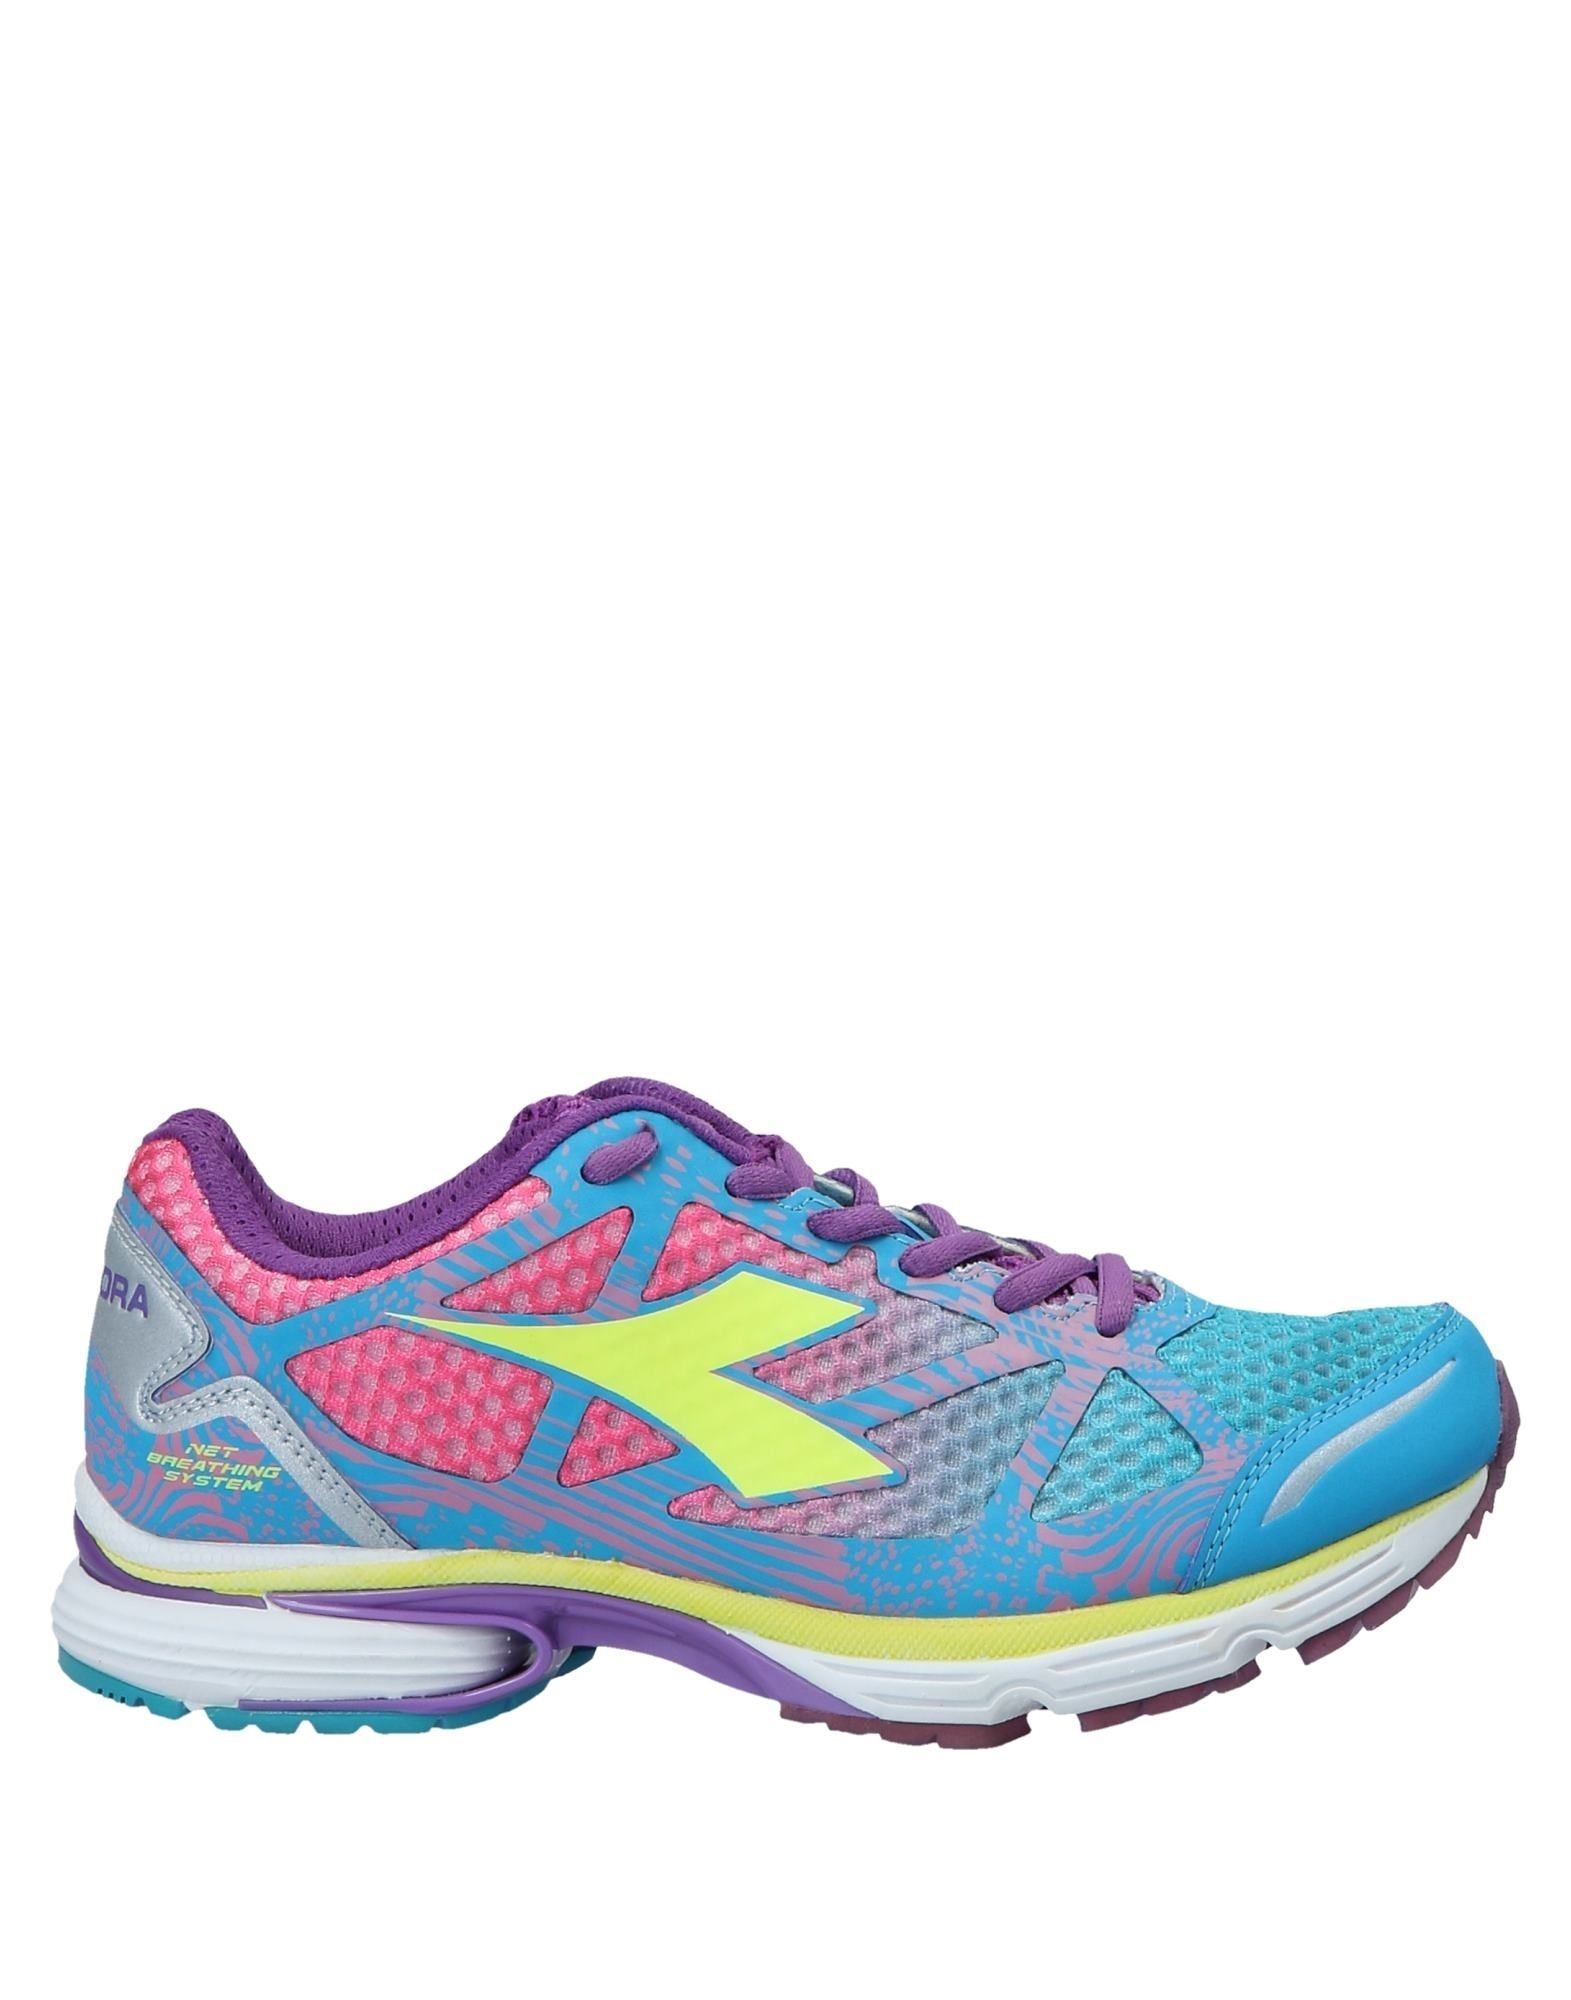 Rabatt echte  Schuhe Diadora Sneakers Herren  echte 11546904GN 0877ec